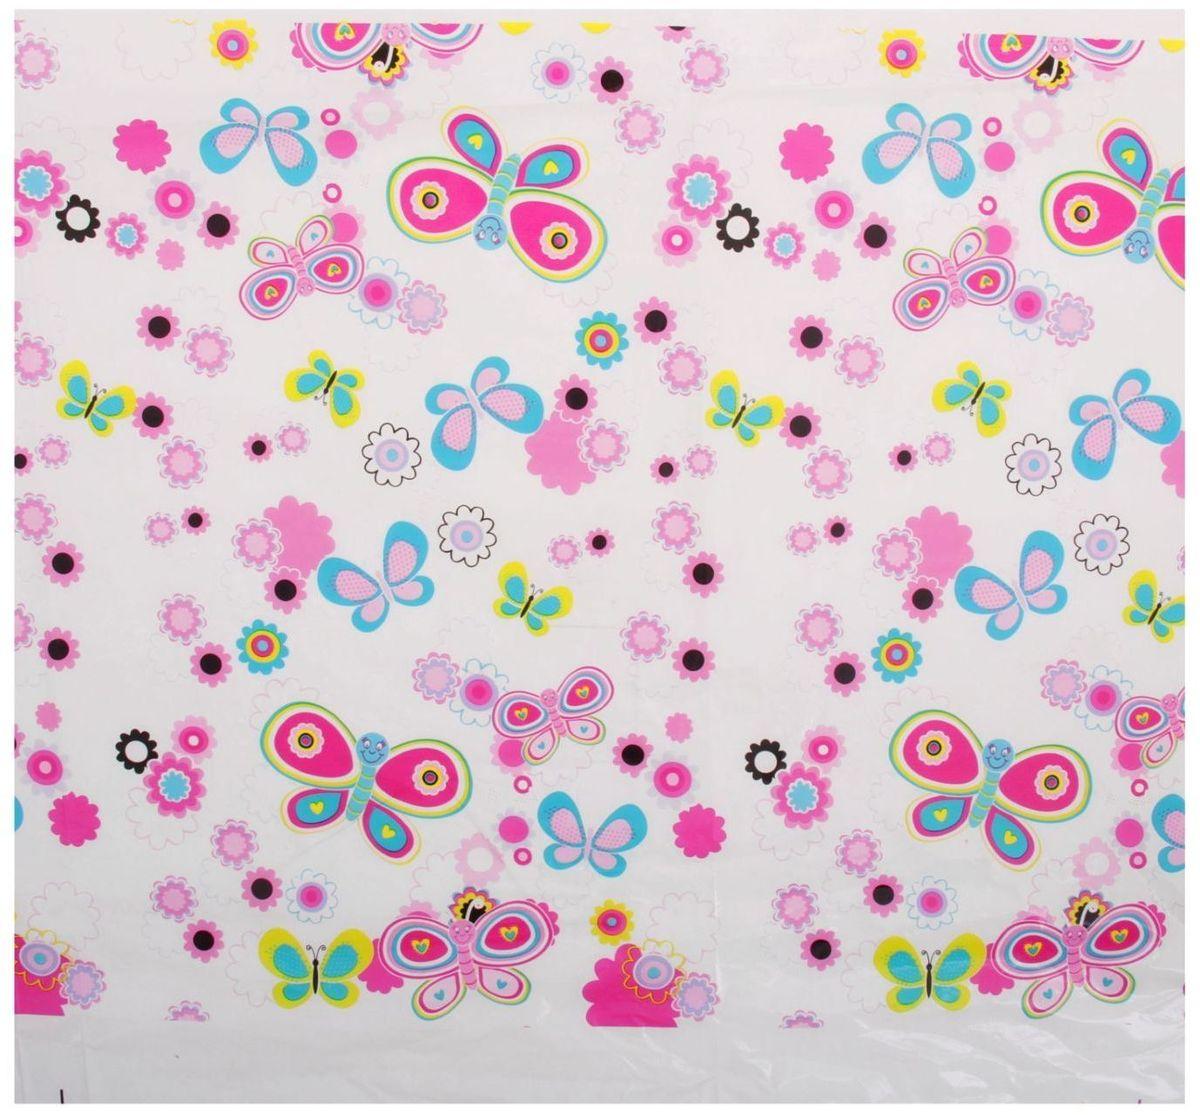 Страна Карнавалия Скатерть 108х180 Цветочки бабочки страна карнавалия скатерть 108х180 цветочки бабочки